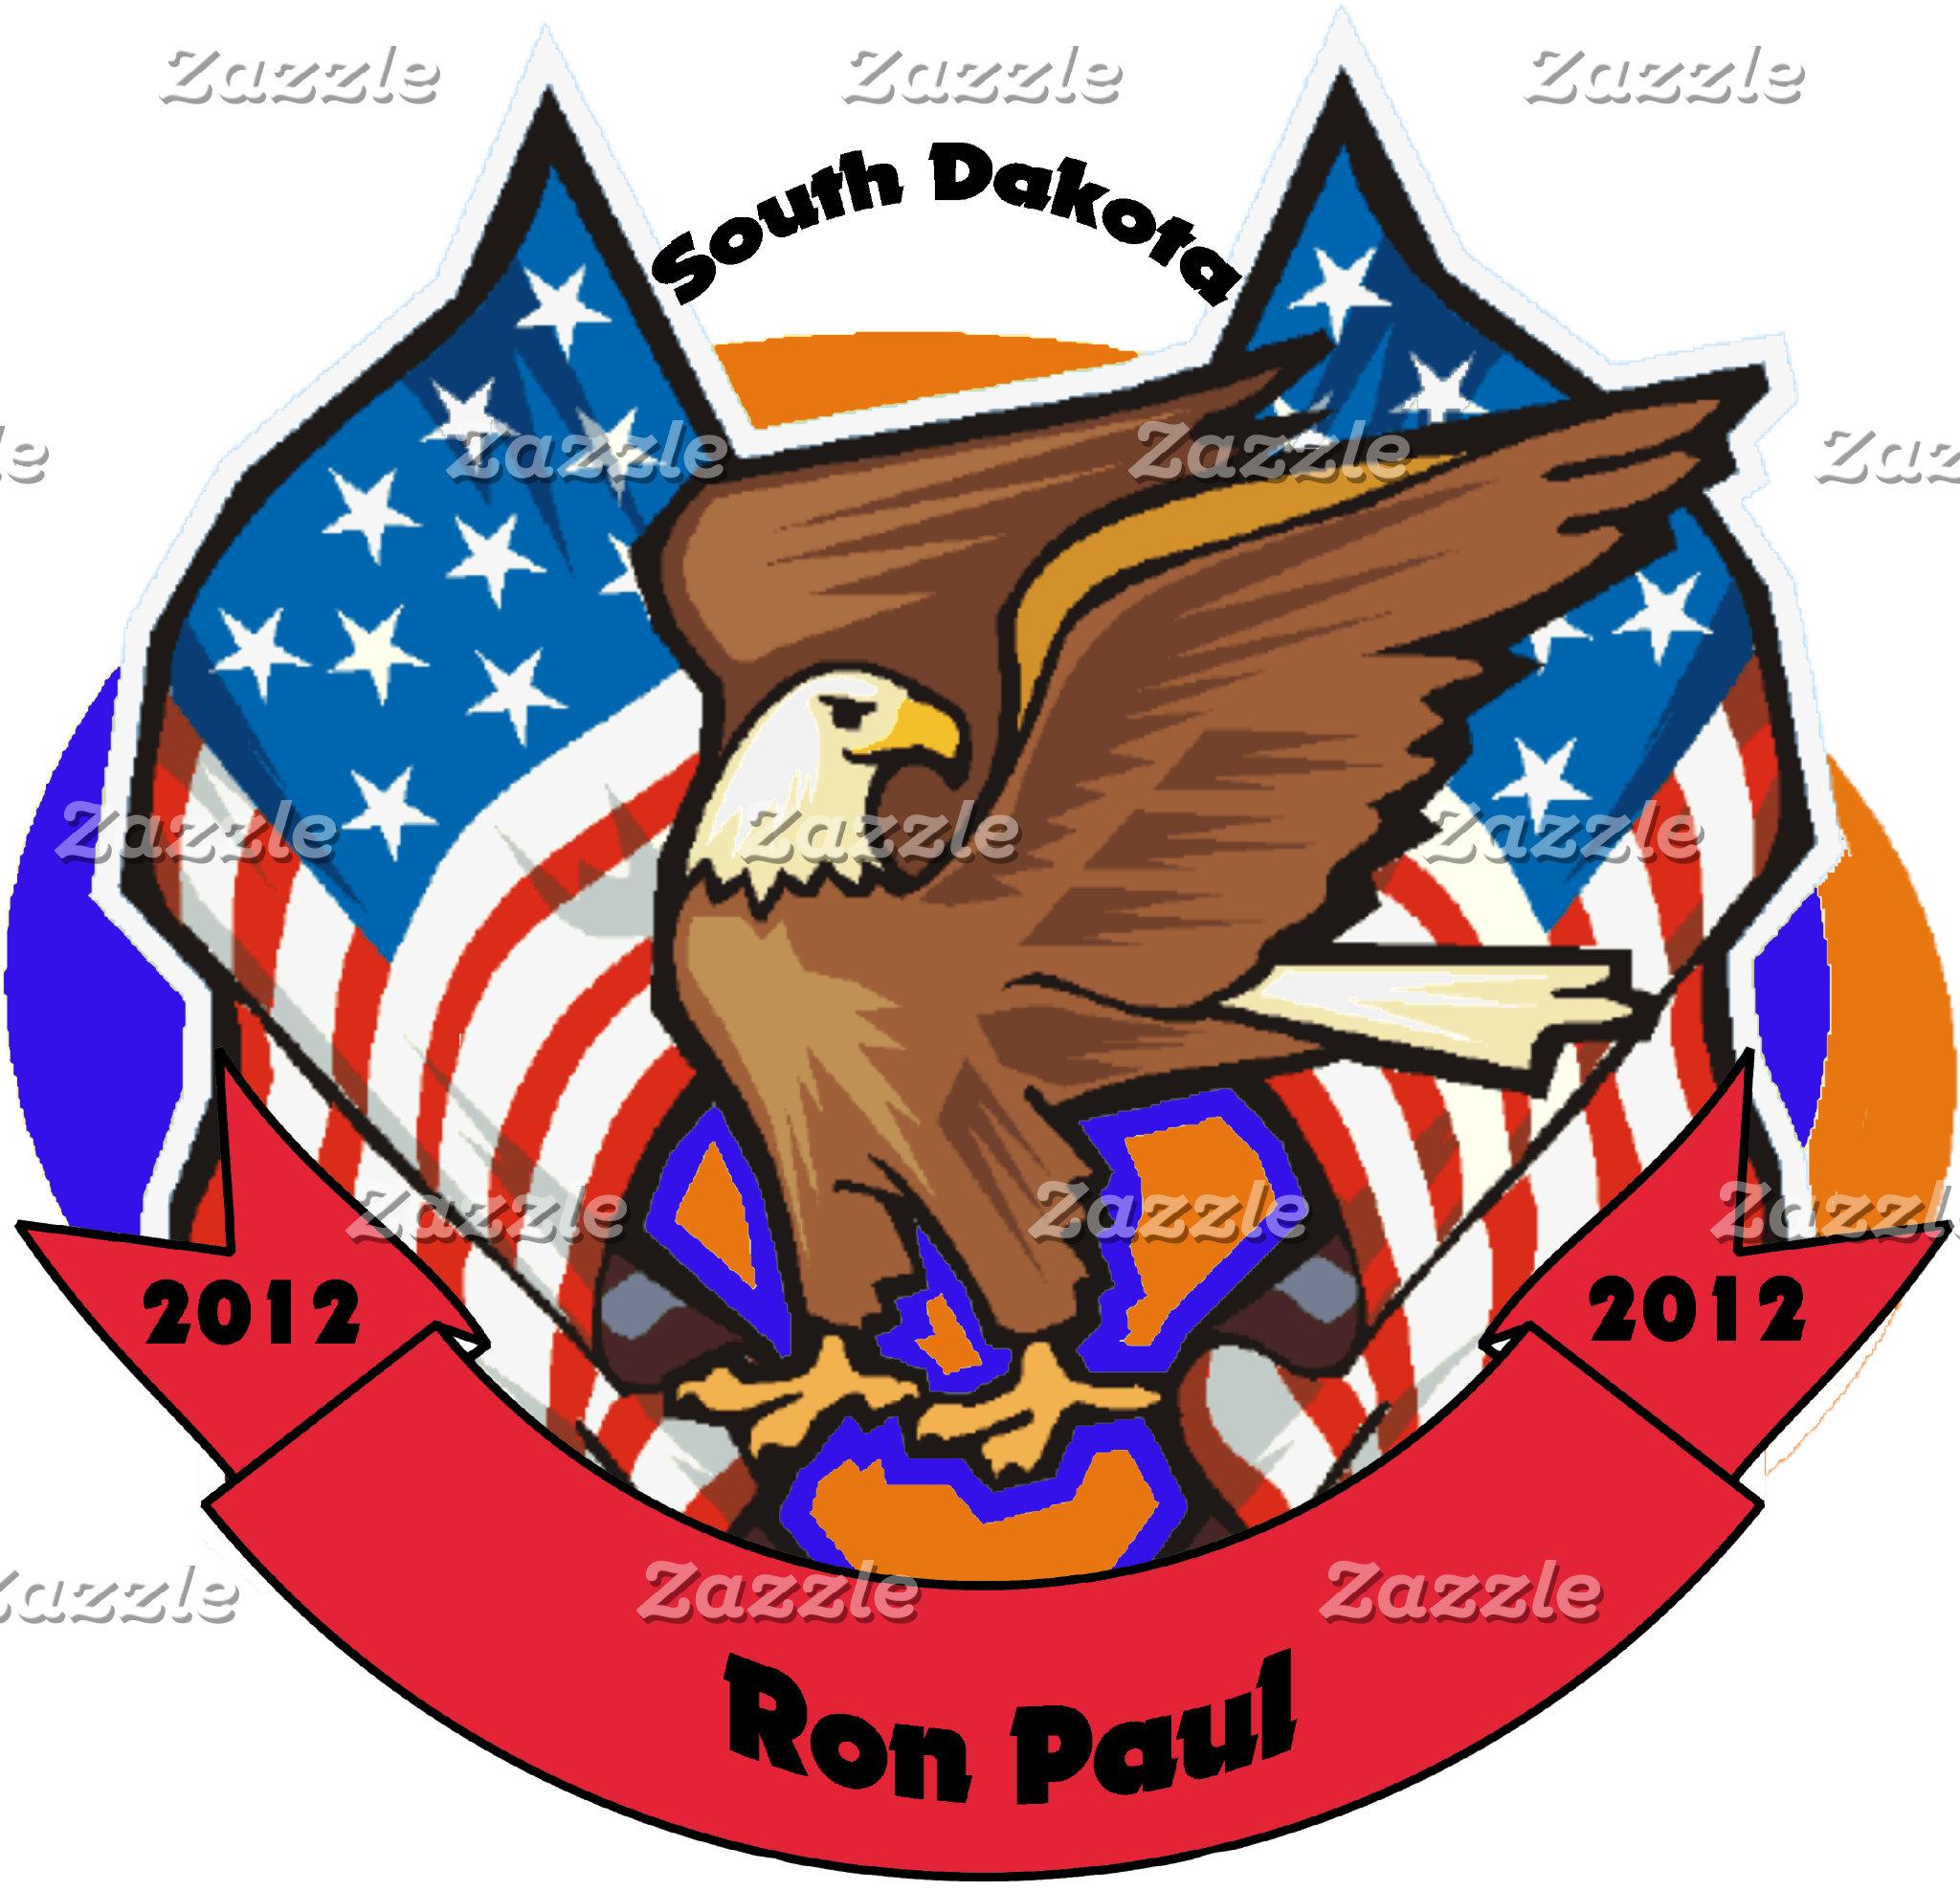 South Dakota for Ron Paul